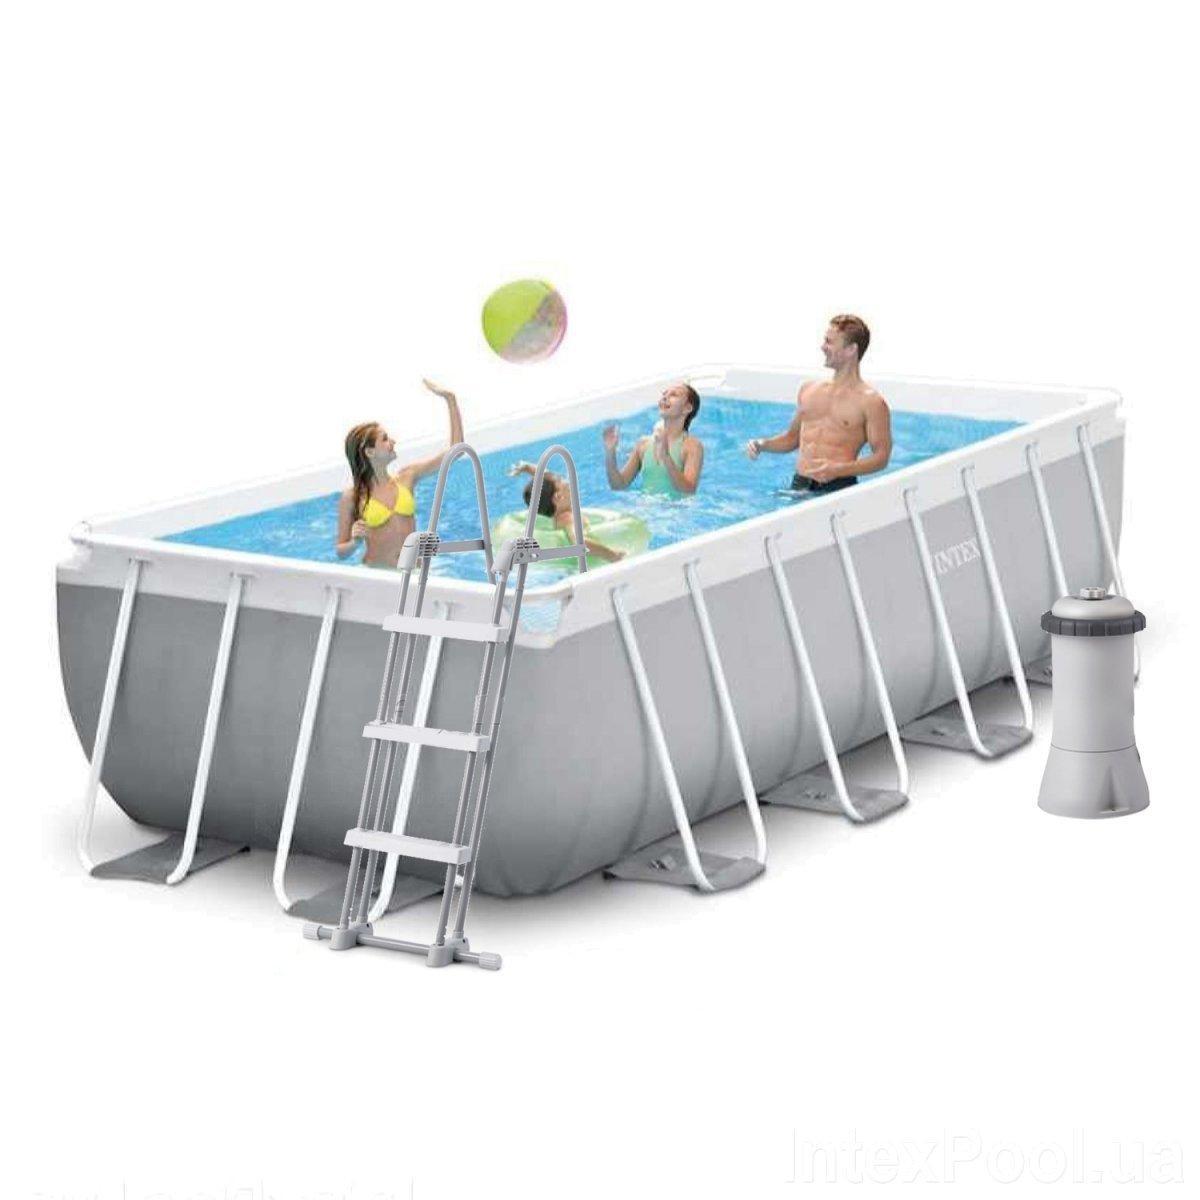 Каркасный бассейн Intex 26788-4, 400 x 200 x 100 см (2 006 л/ч, лестница, тент, подстилка)